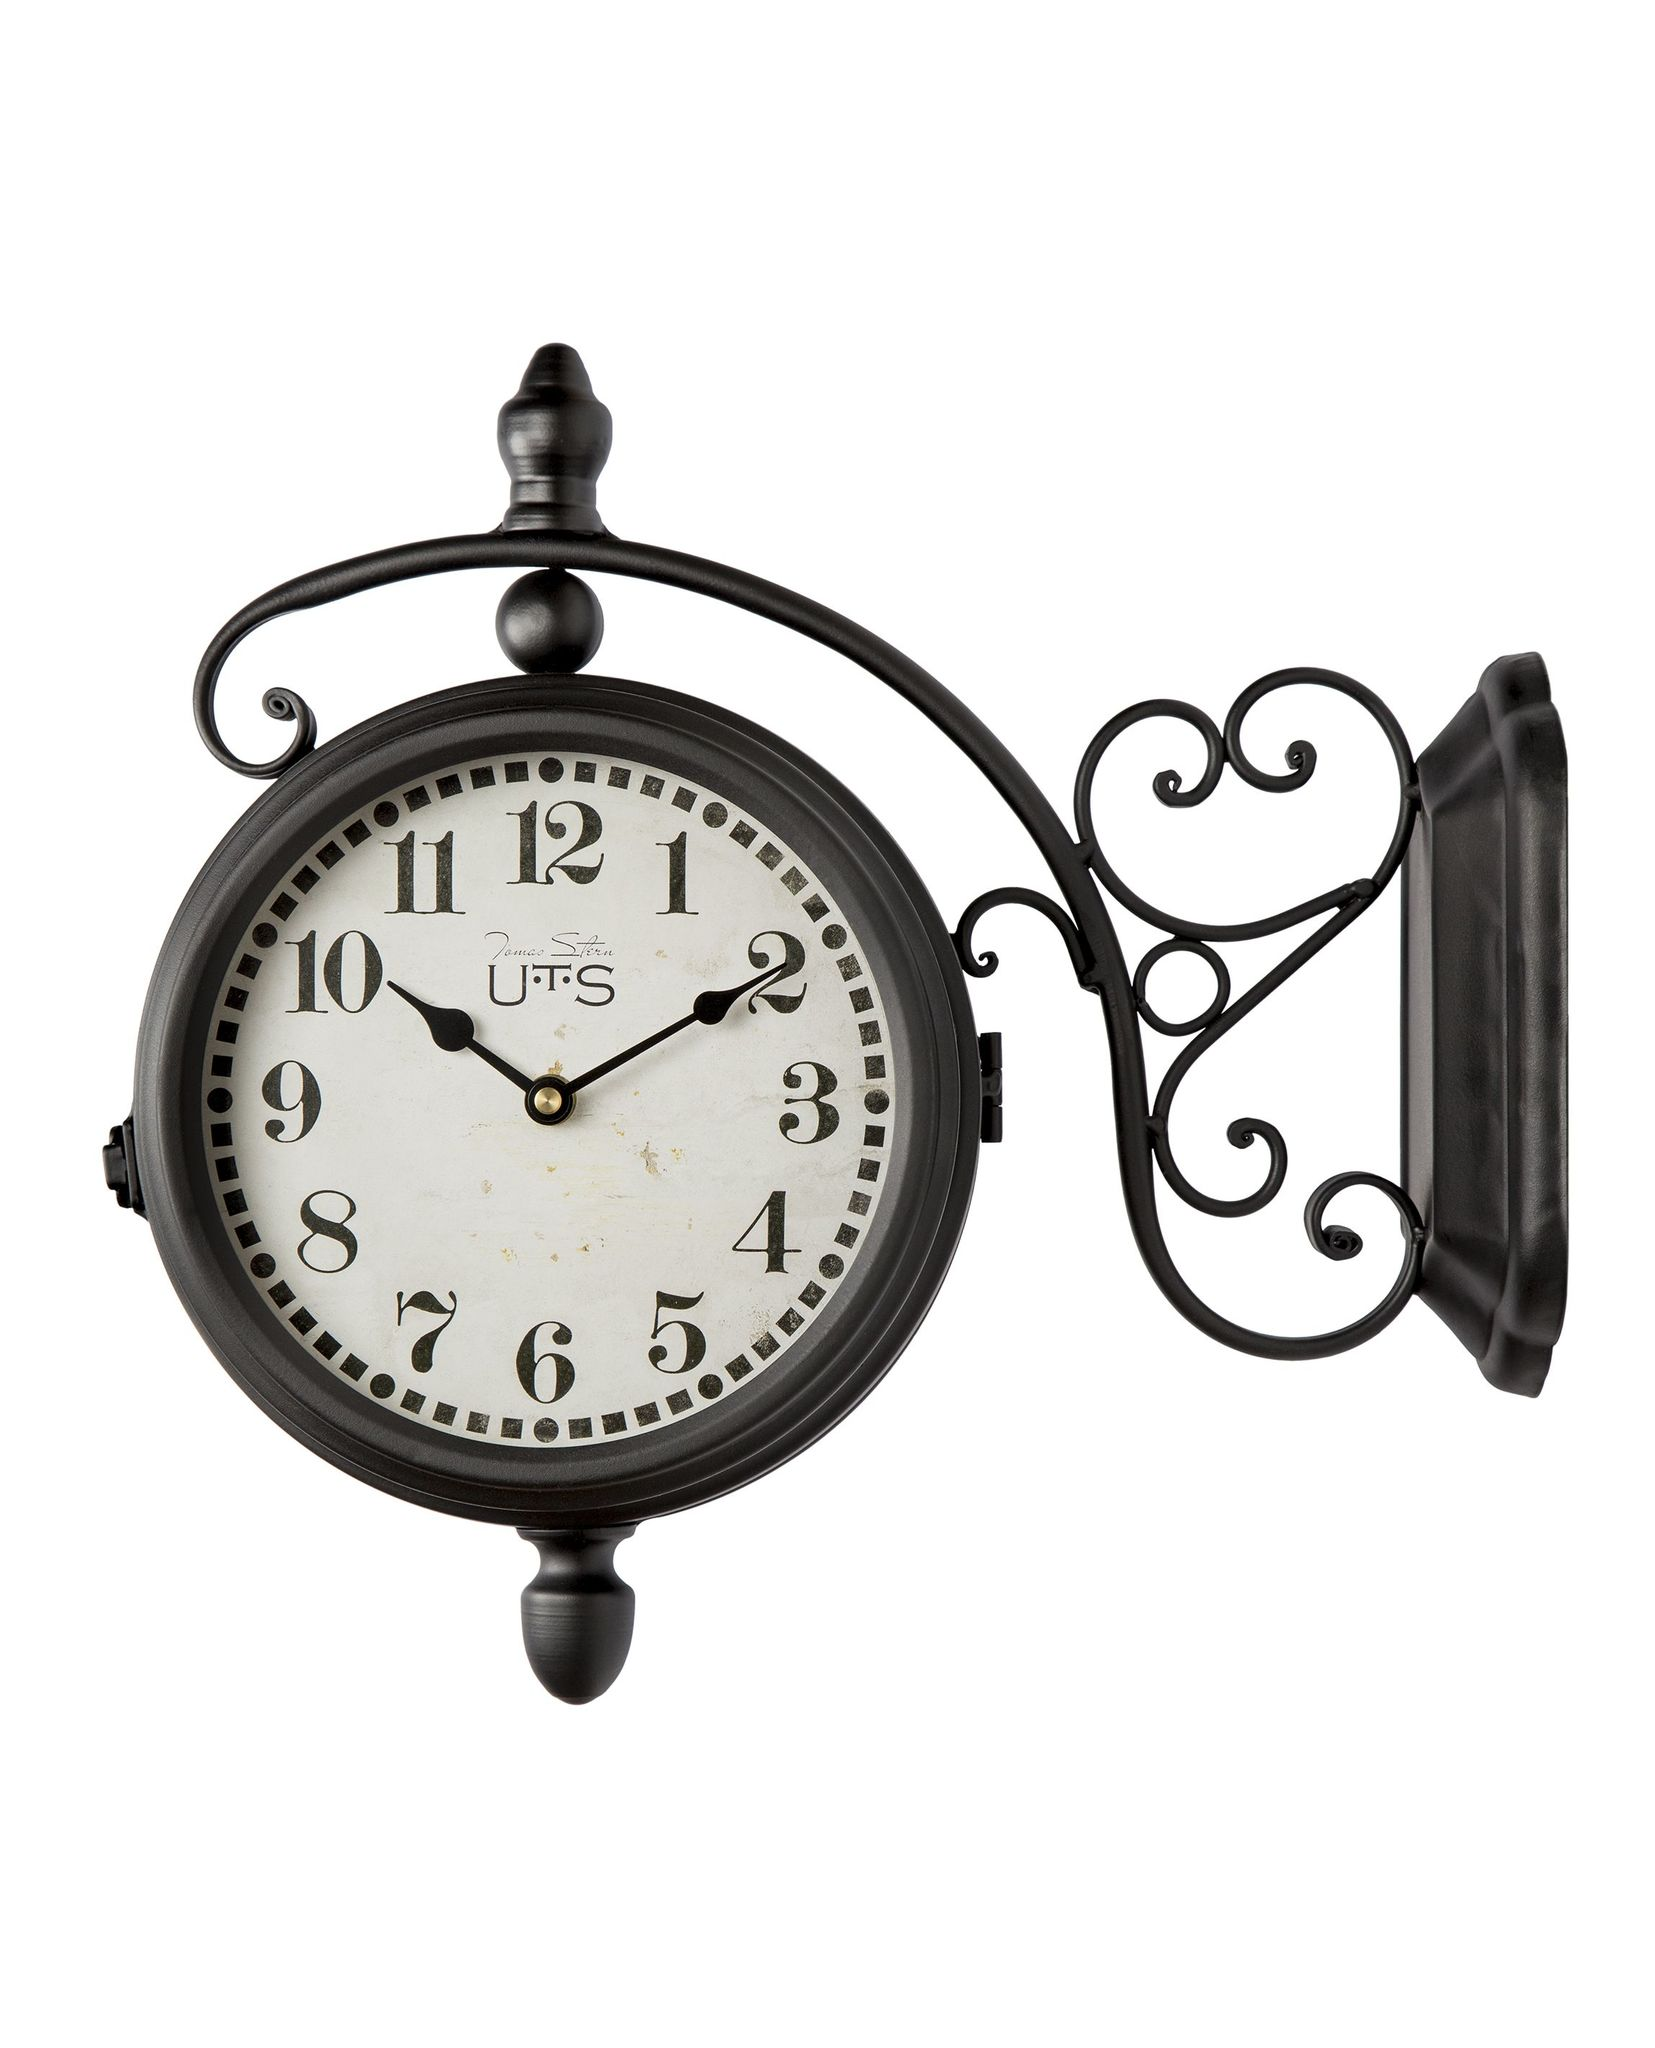 Часы настенные Часы настенные Tomas Stern 9051 chasy-nastennye-tomas-stern-9051-germaniya.jpg